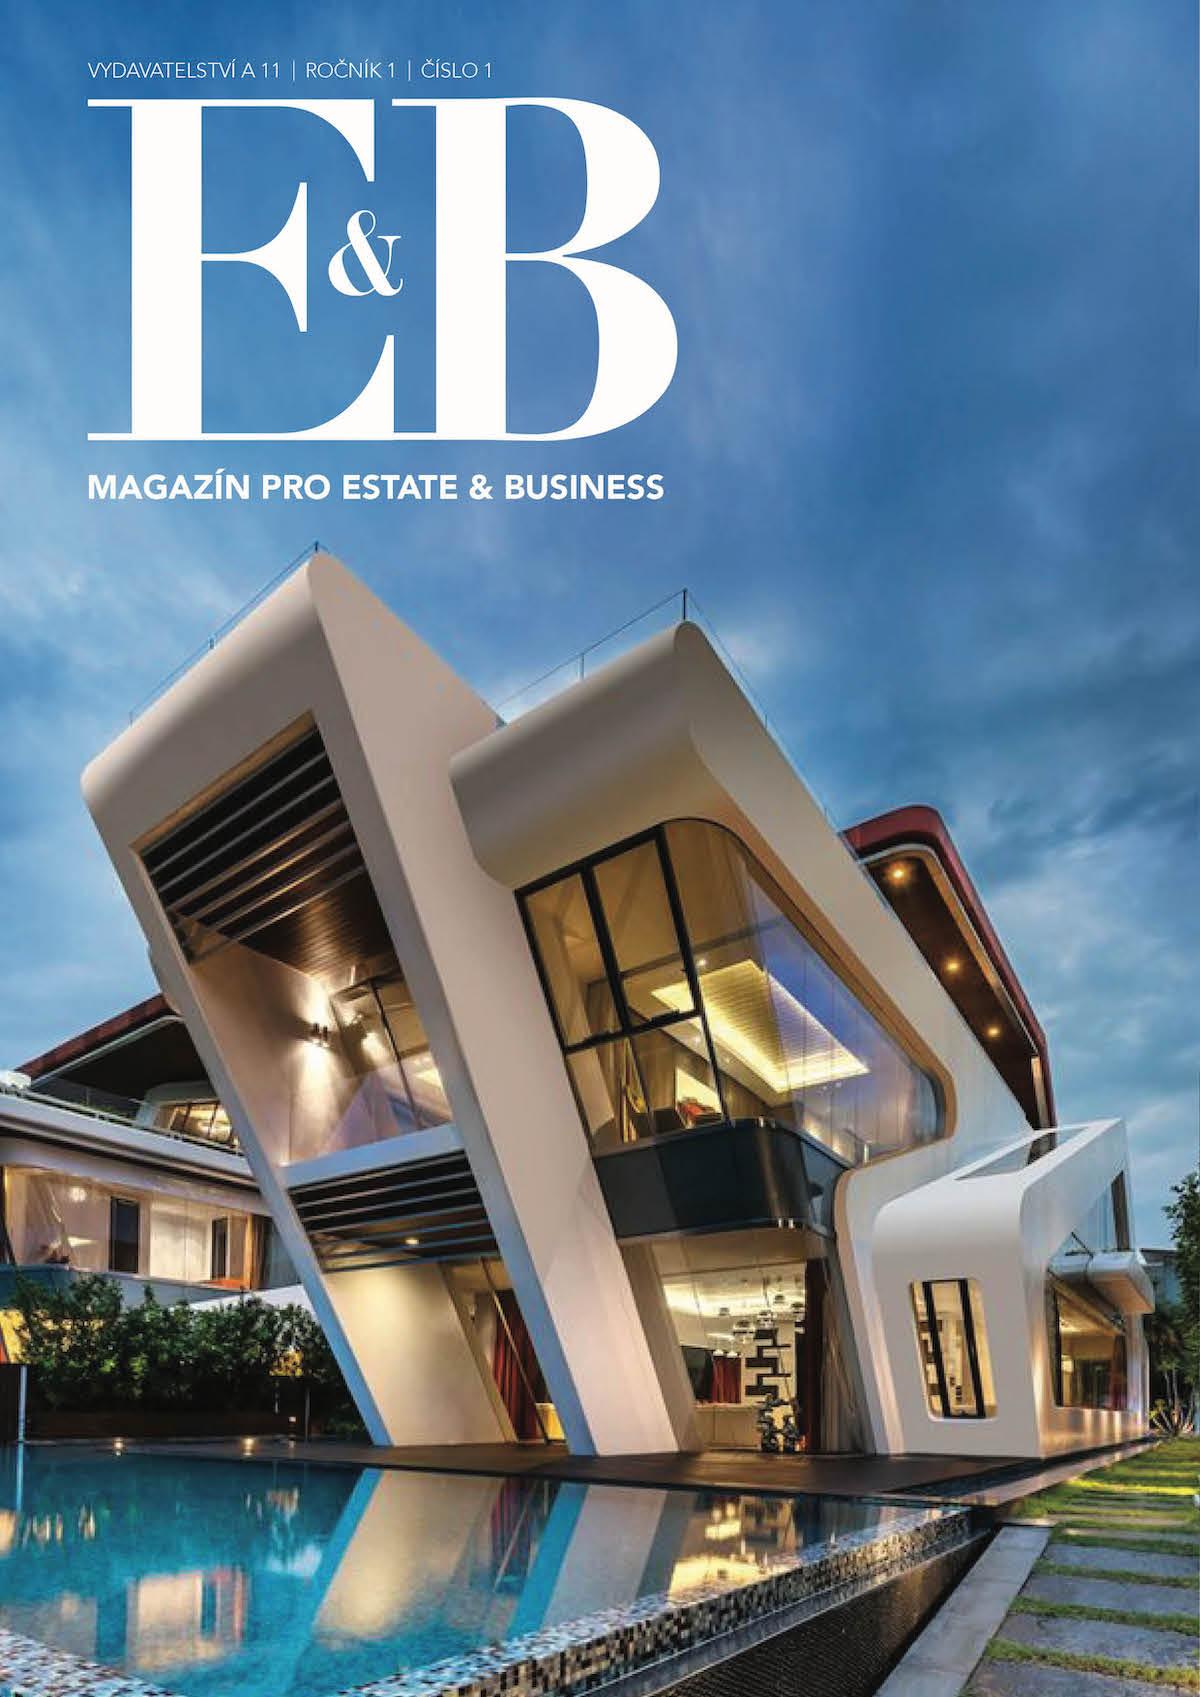 Magazín pro estate a business E&B